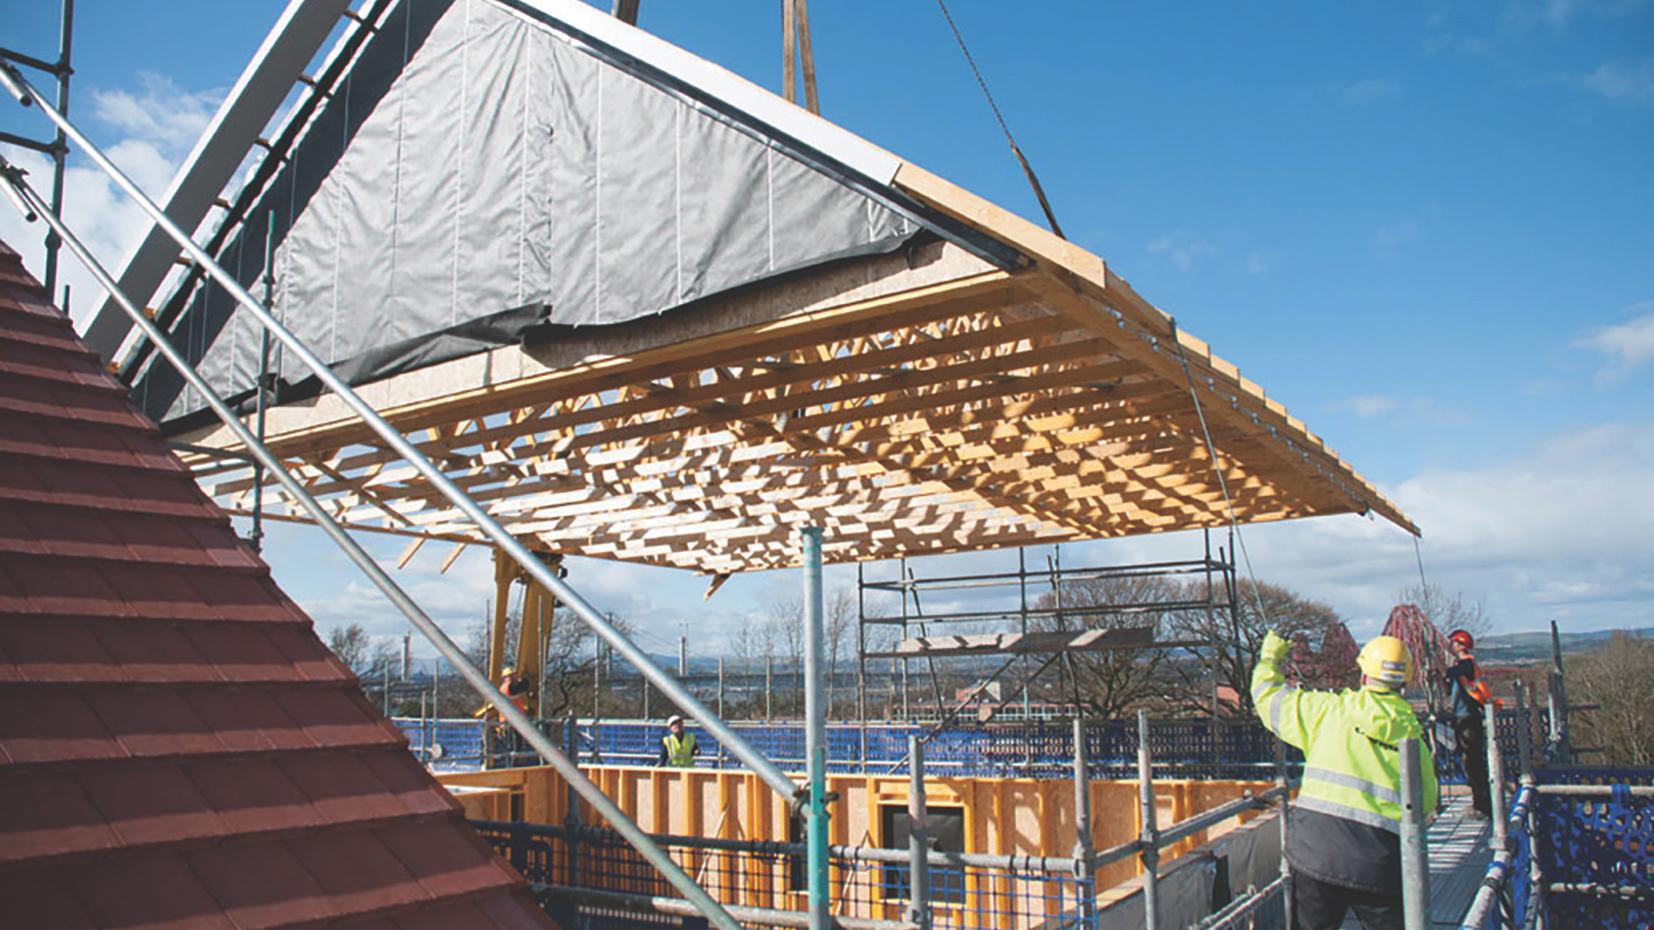 Housebuilder Barratt, which has set itself demanding carbon reduction targets, bought timber manufacturer Oregon last year